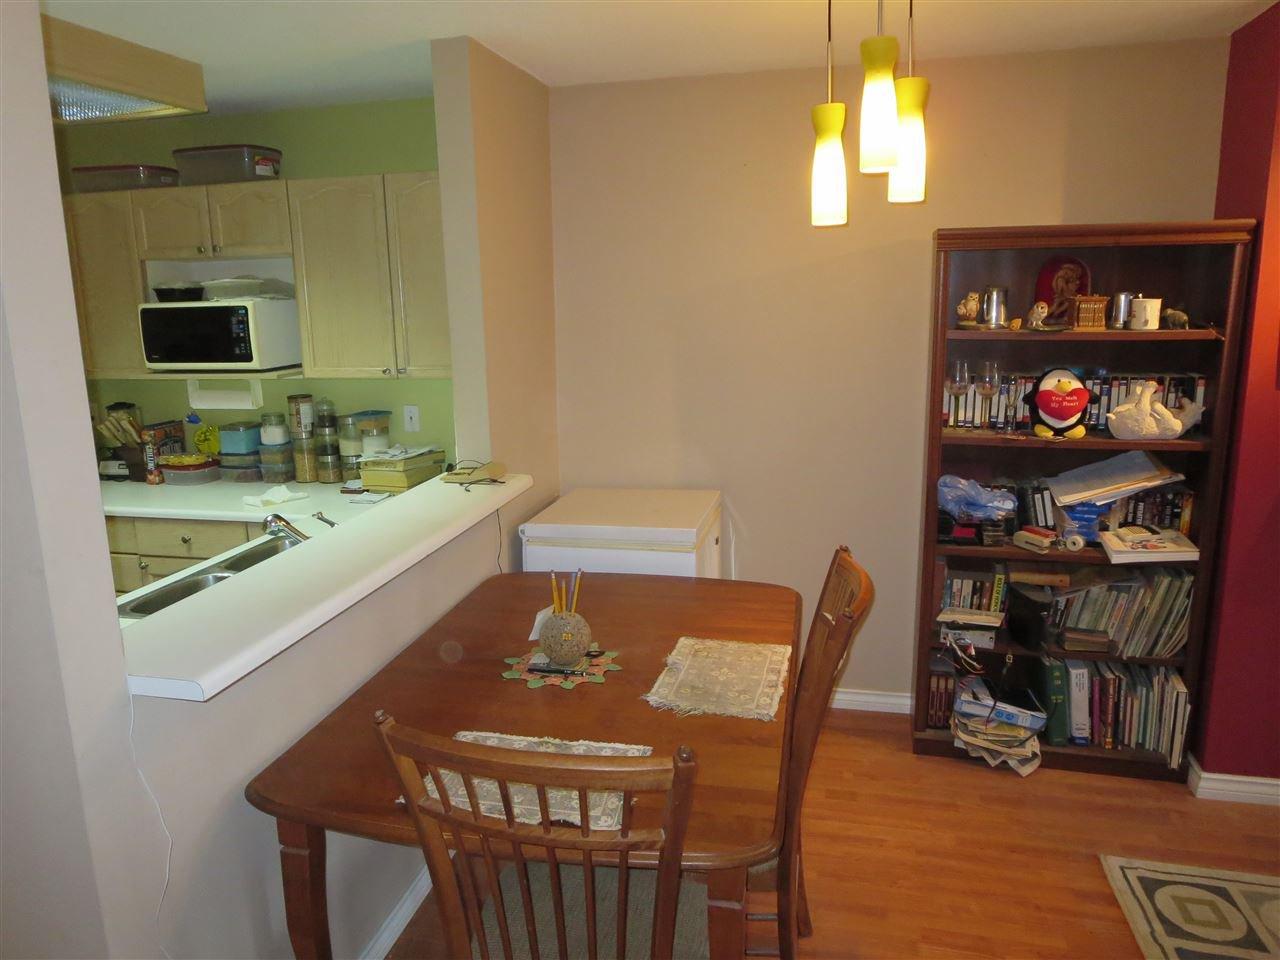 Photo 3: Photos: 317 98 LAVAL Street in Coquitlam: Maillardville Condo for sale : MLS®# R2117700